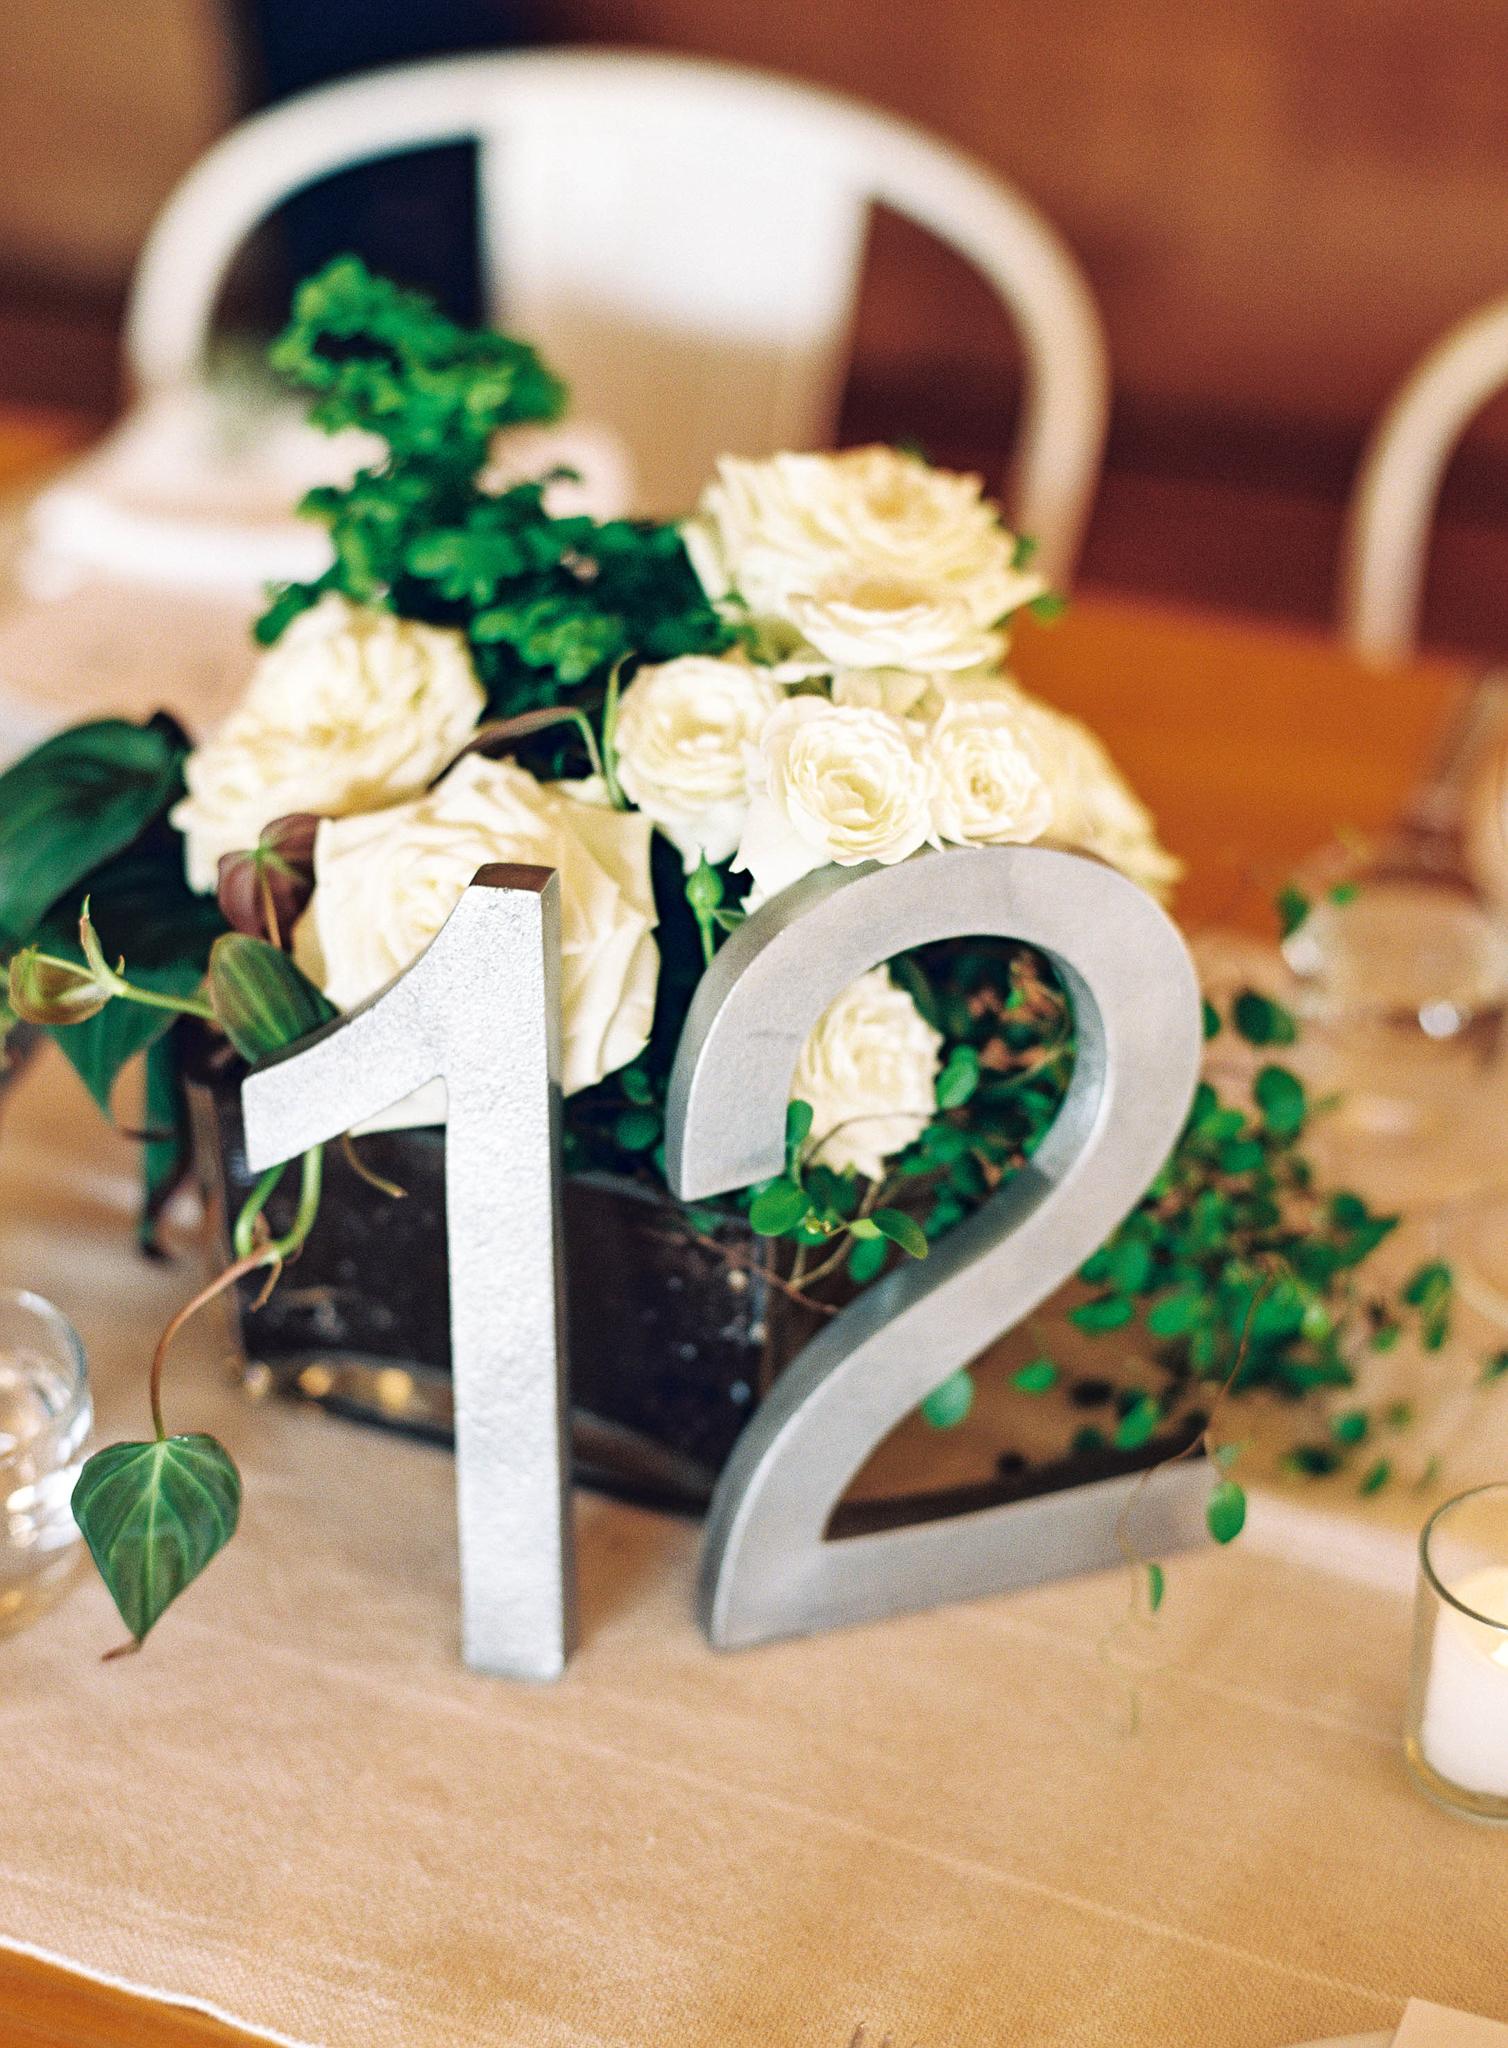 Meghan Mehan Photography - Fine Art Film Wedding Photography - San Francisco   Napa   Sonoma   Big Sur   Chicago   Minneapolis   Milwaukee   Lake Geneva   Door County   Wisconsin 070.jpg